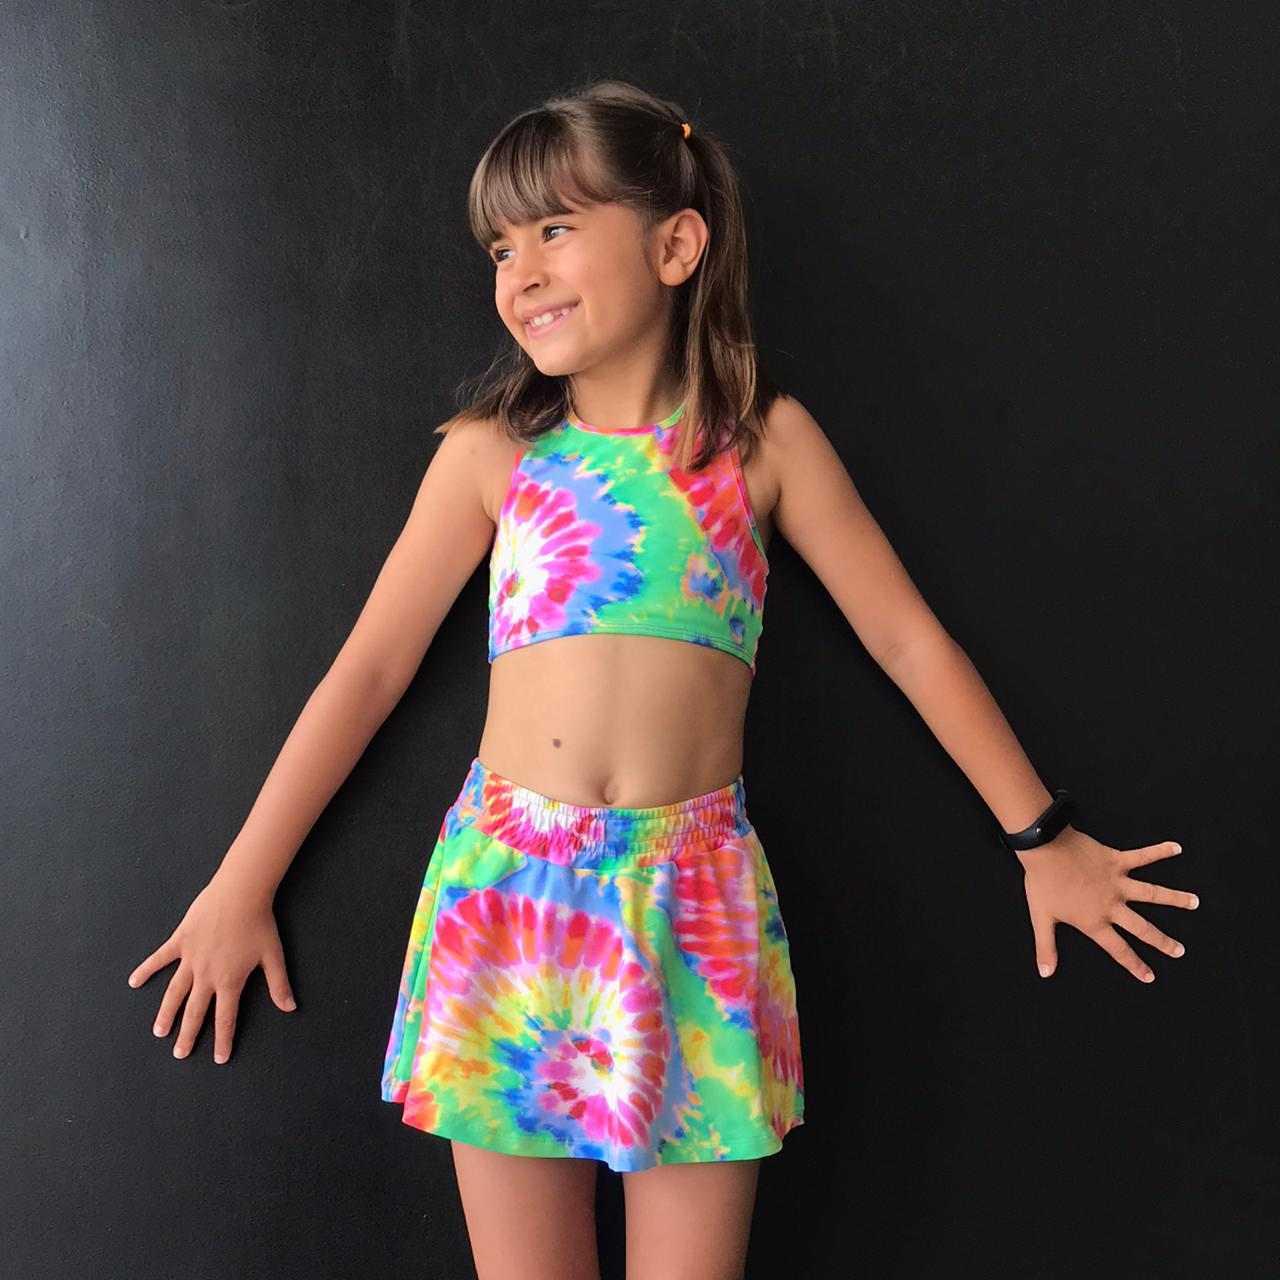 Sunquini Infantil Estampado Tie Dye